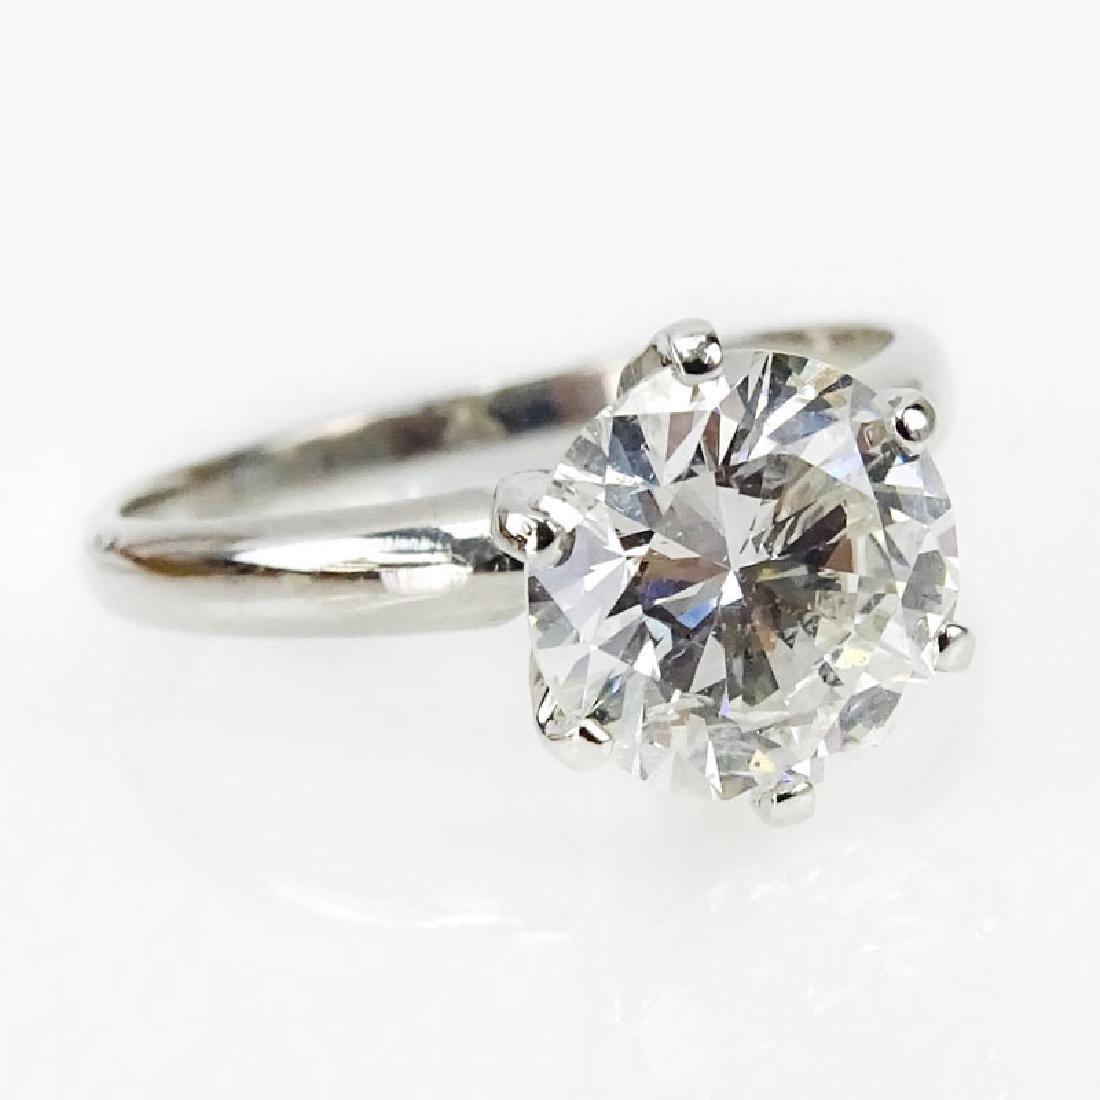 EGL Certified 2.06 Carat Round Brilliant Cut Diamond